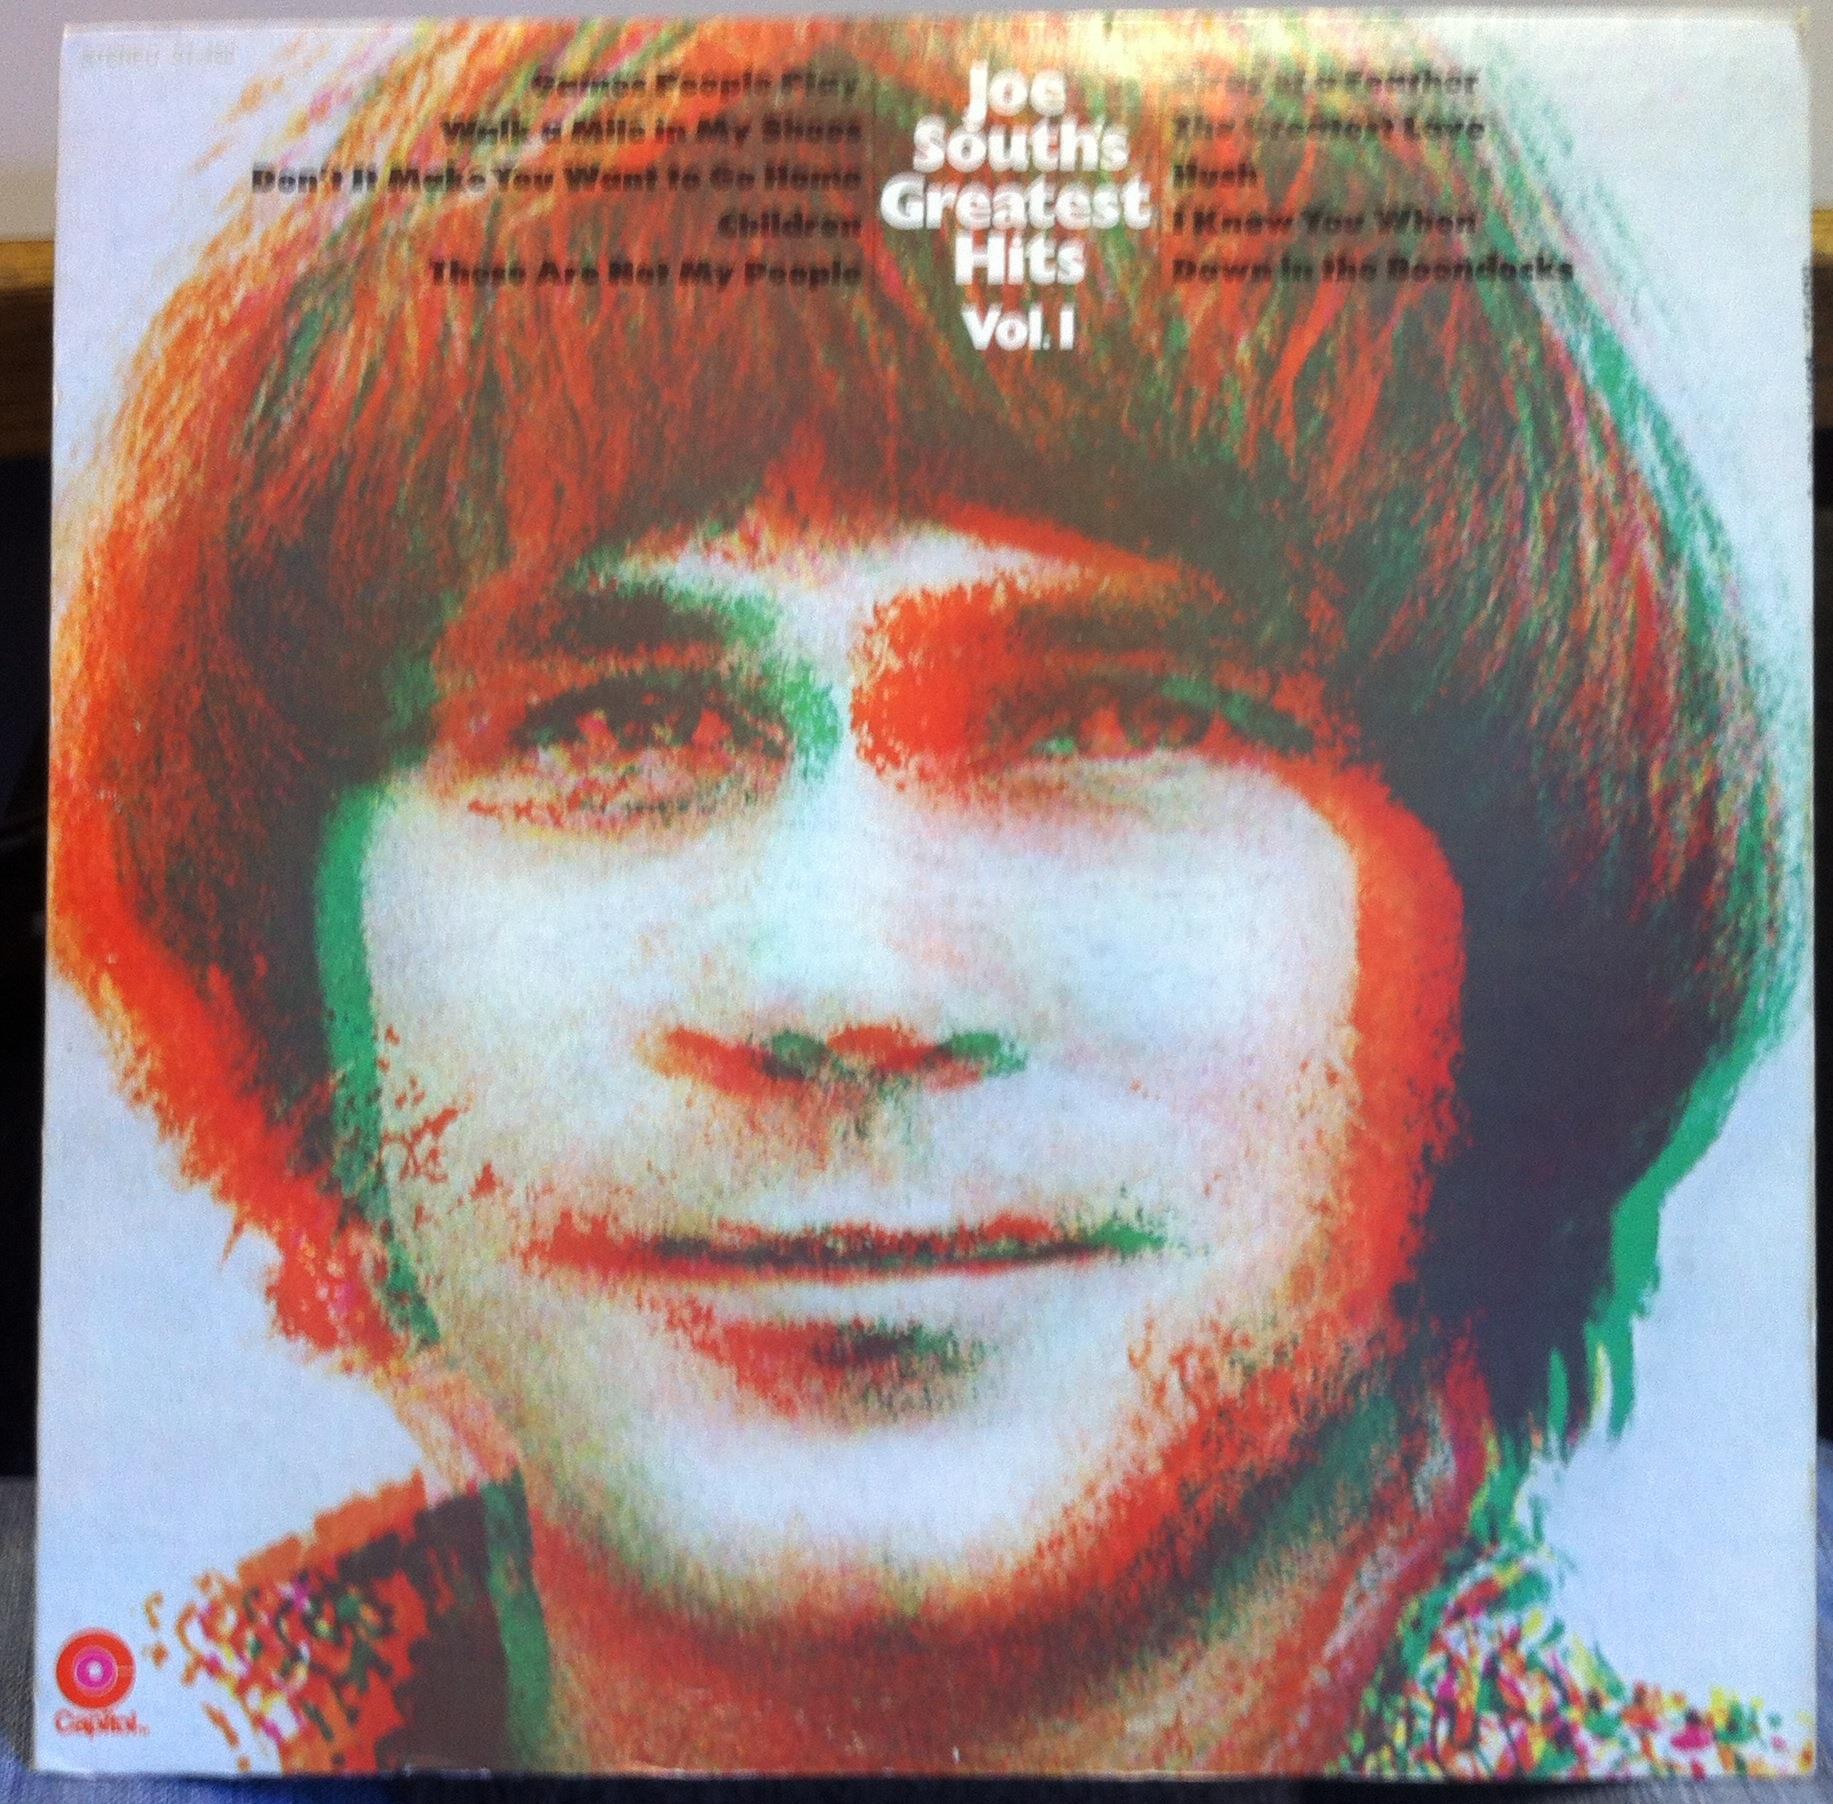 JOE SOUTHS - Joe Souths Greatest Hits Vol 1 Lp Vg St-450 Vinyl 1969 Record (greatest Hits Vol 1)